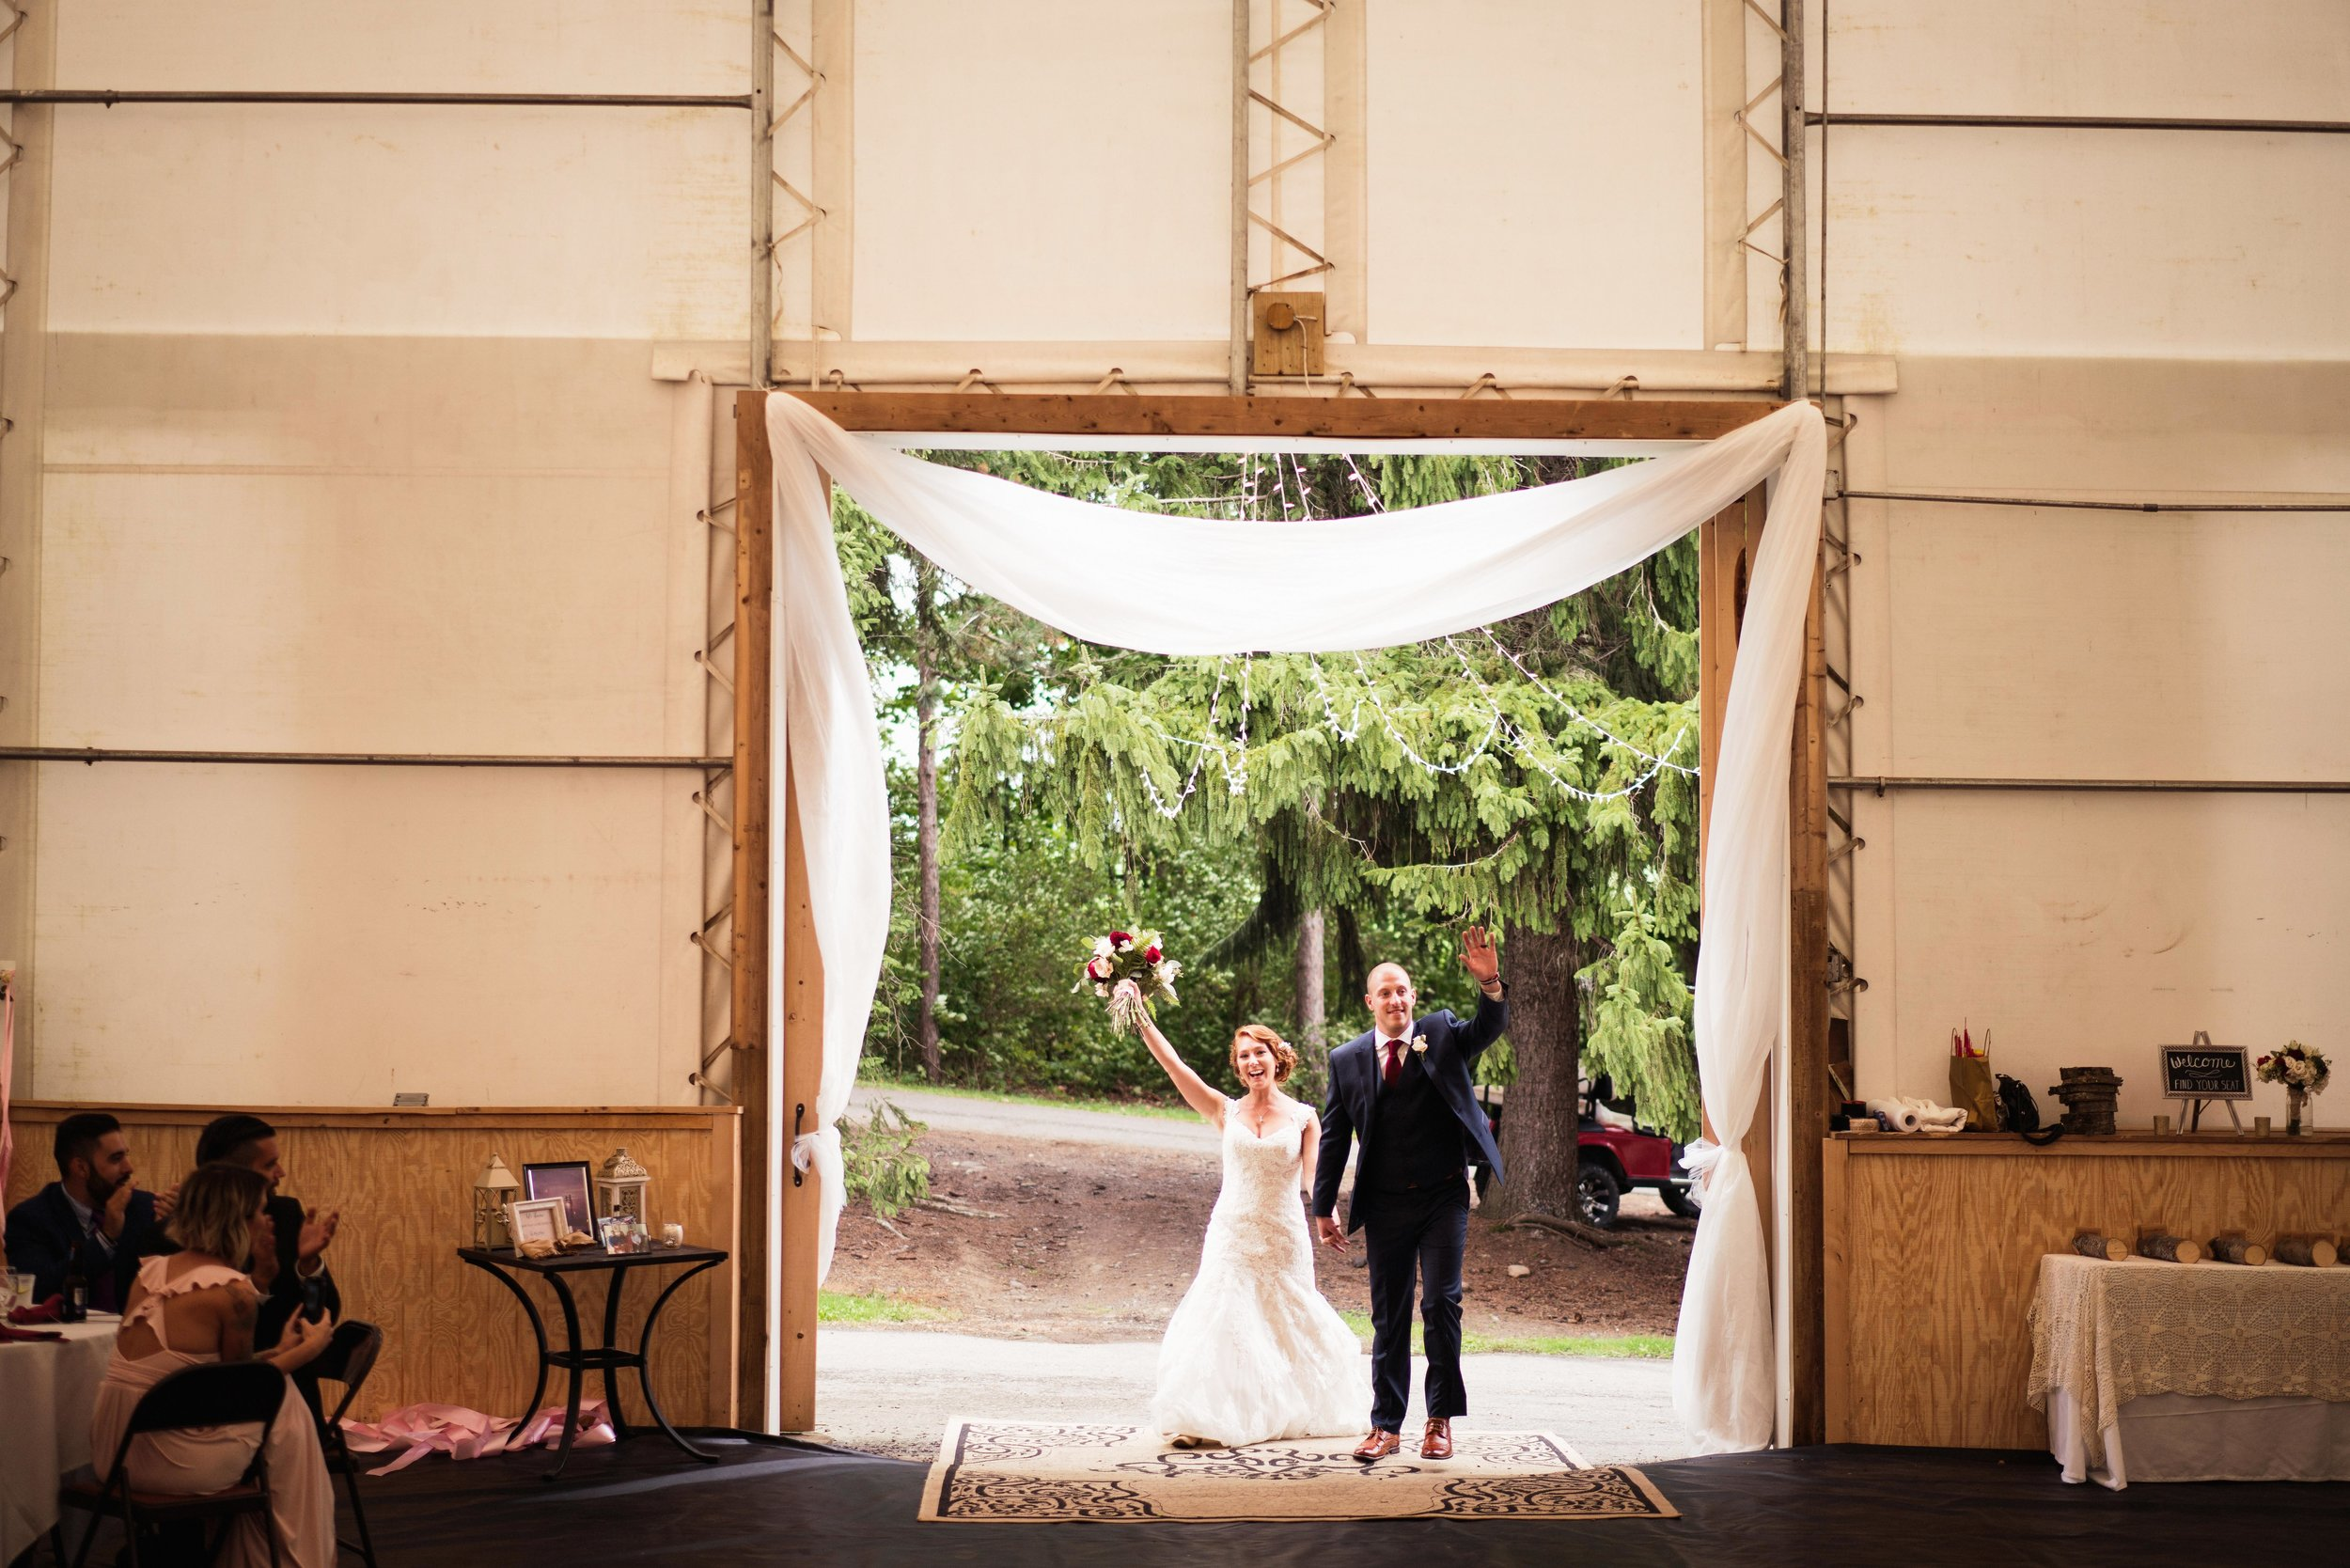 Blog-Lisa-James-Wedding-at Rosebud Estate Weddings in Arcade NY by Stefan-Ludwig-Photography-Buffalo-NY-64-x.jpg